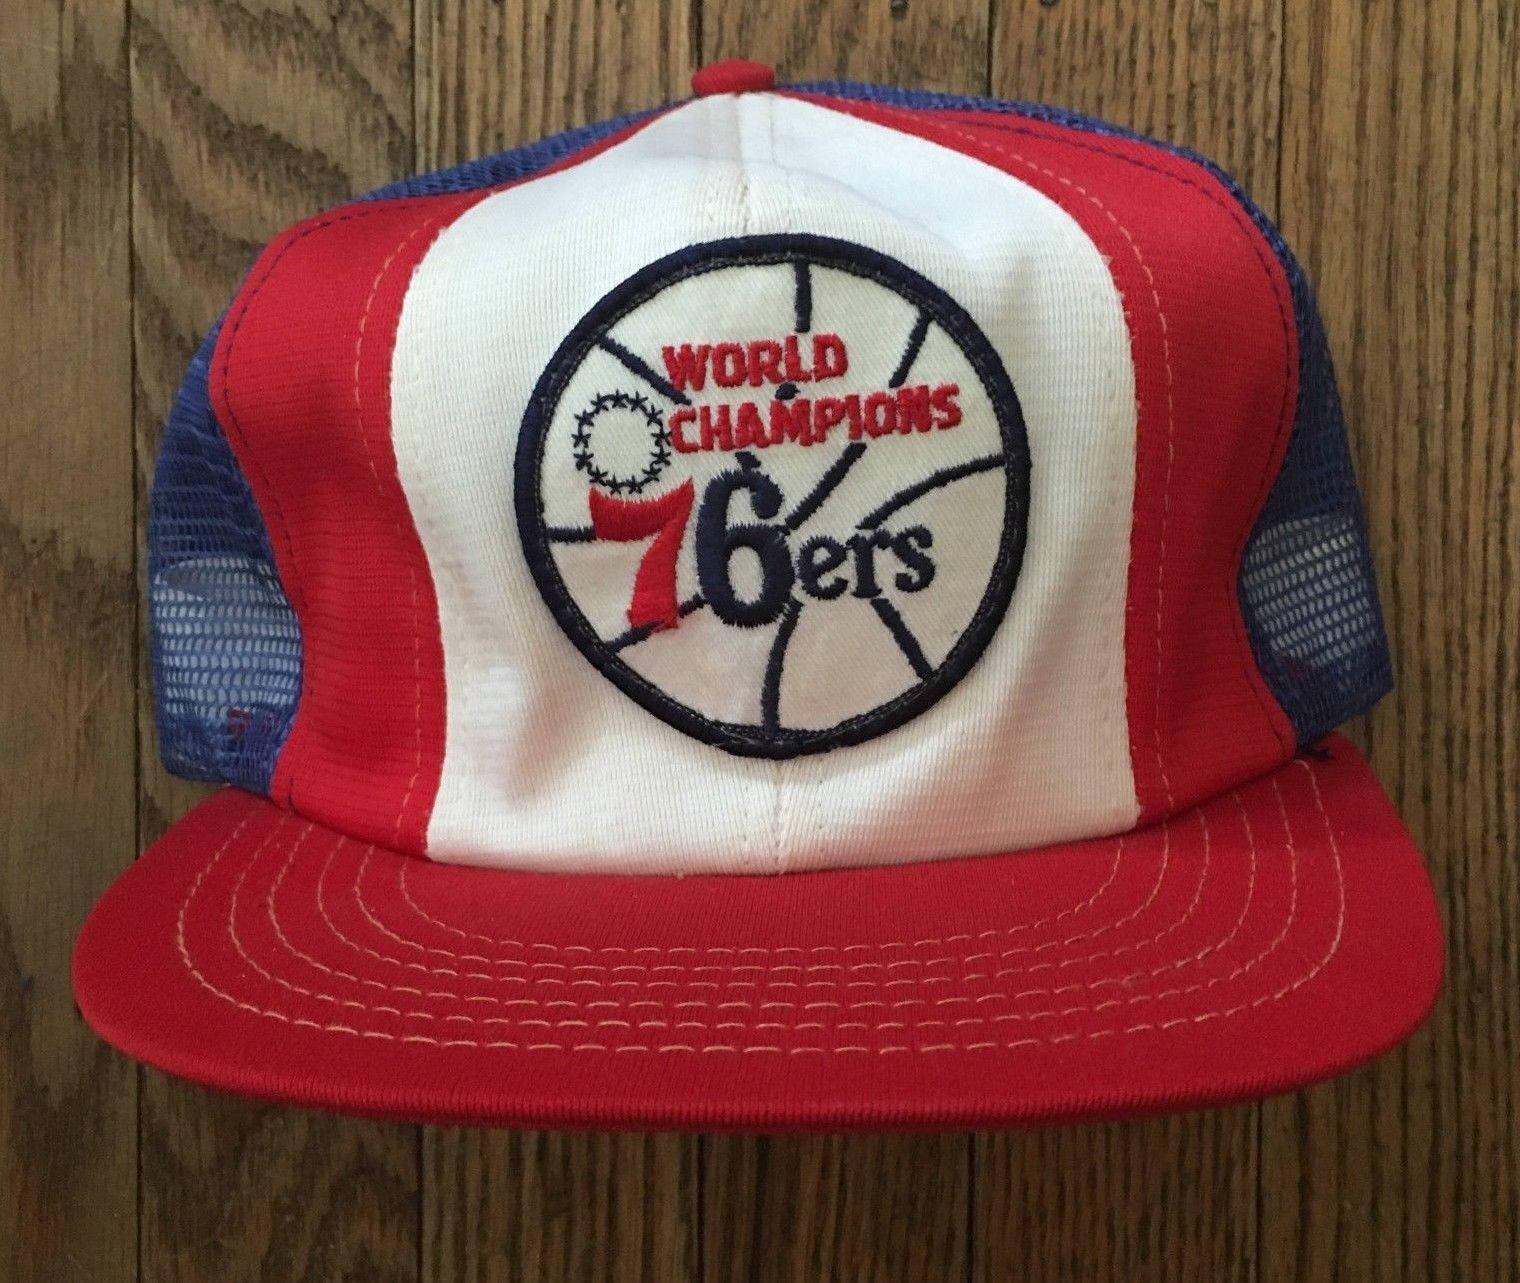 Vintage 1983 Champions Philadelphia 76ers NBA Mesh Trucker Hat Snapback Hat  Baseball Cap Patch   Made 1ba4c4a463c